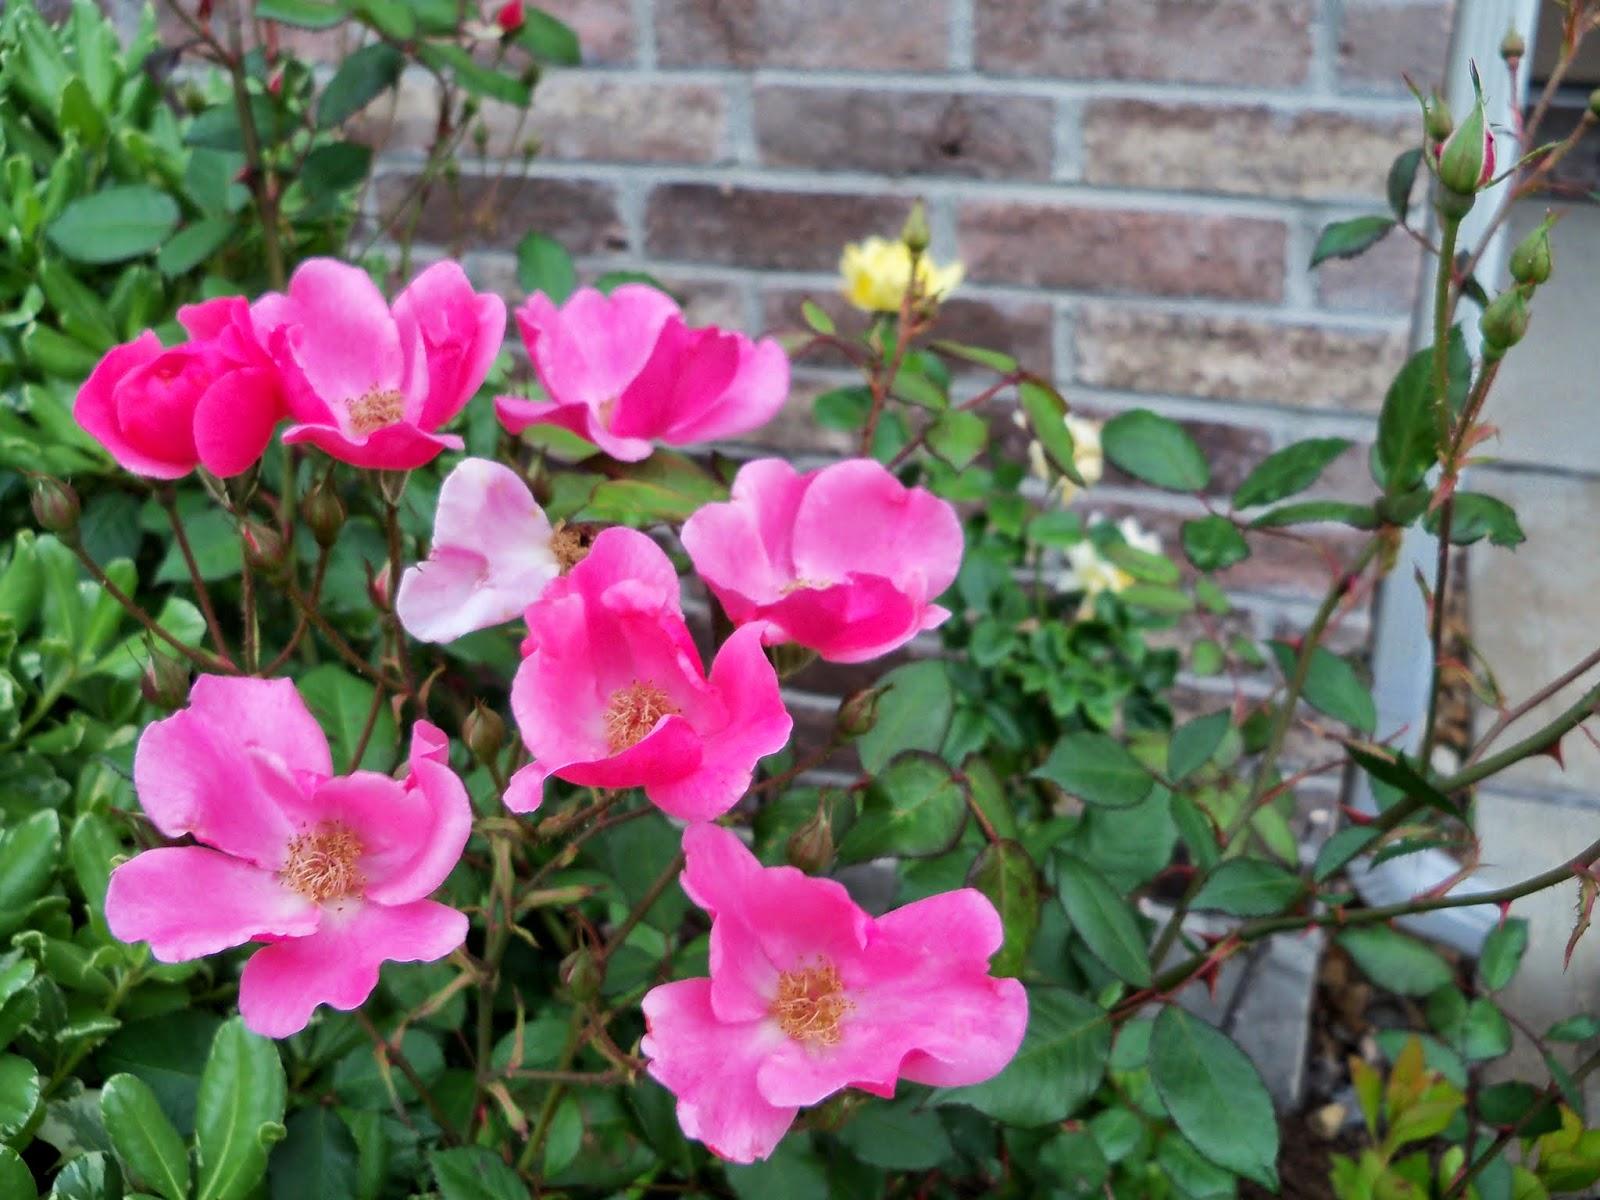 Gardening 2014 - 116_1509.JPG